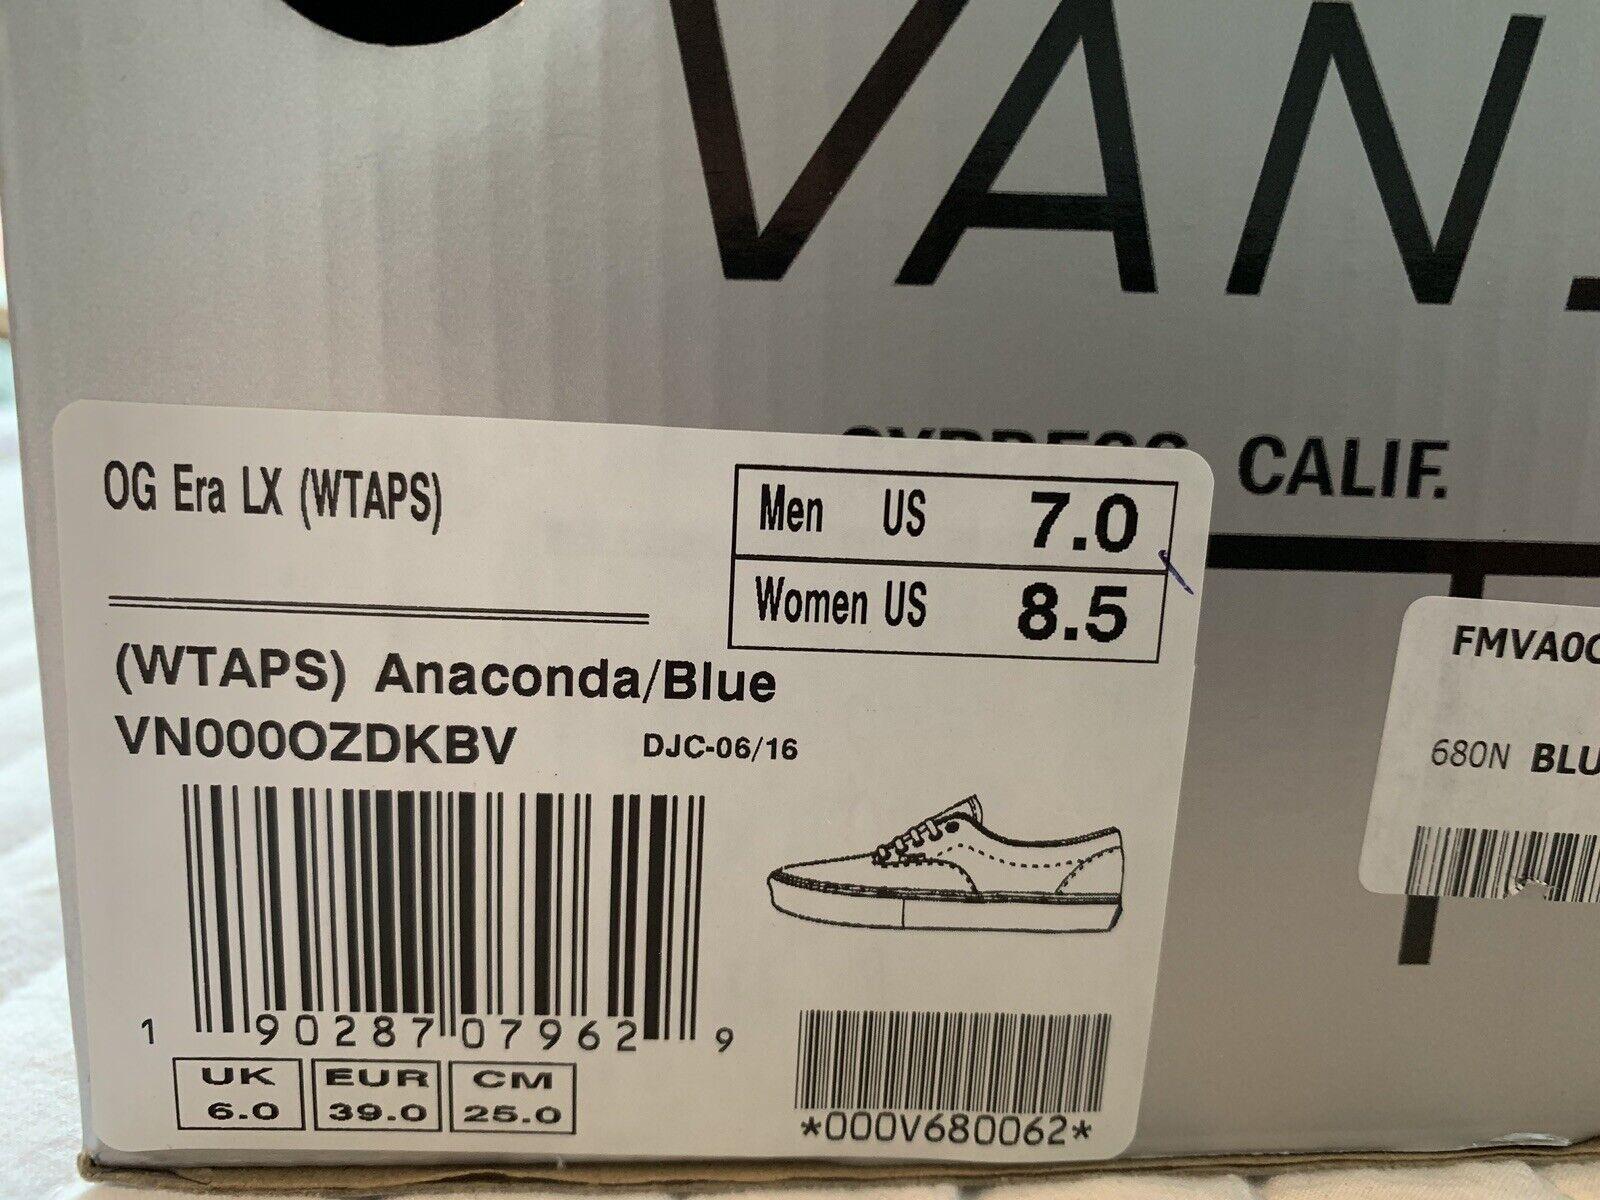 Vans X Wtaps OG ERA LX Anaconda bluee Size 7 MEN supreme vault syndicate